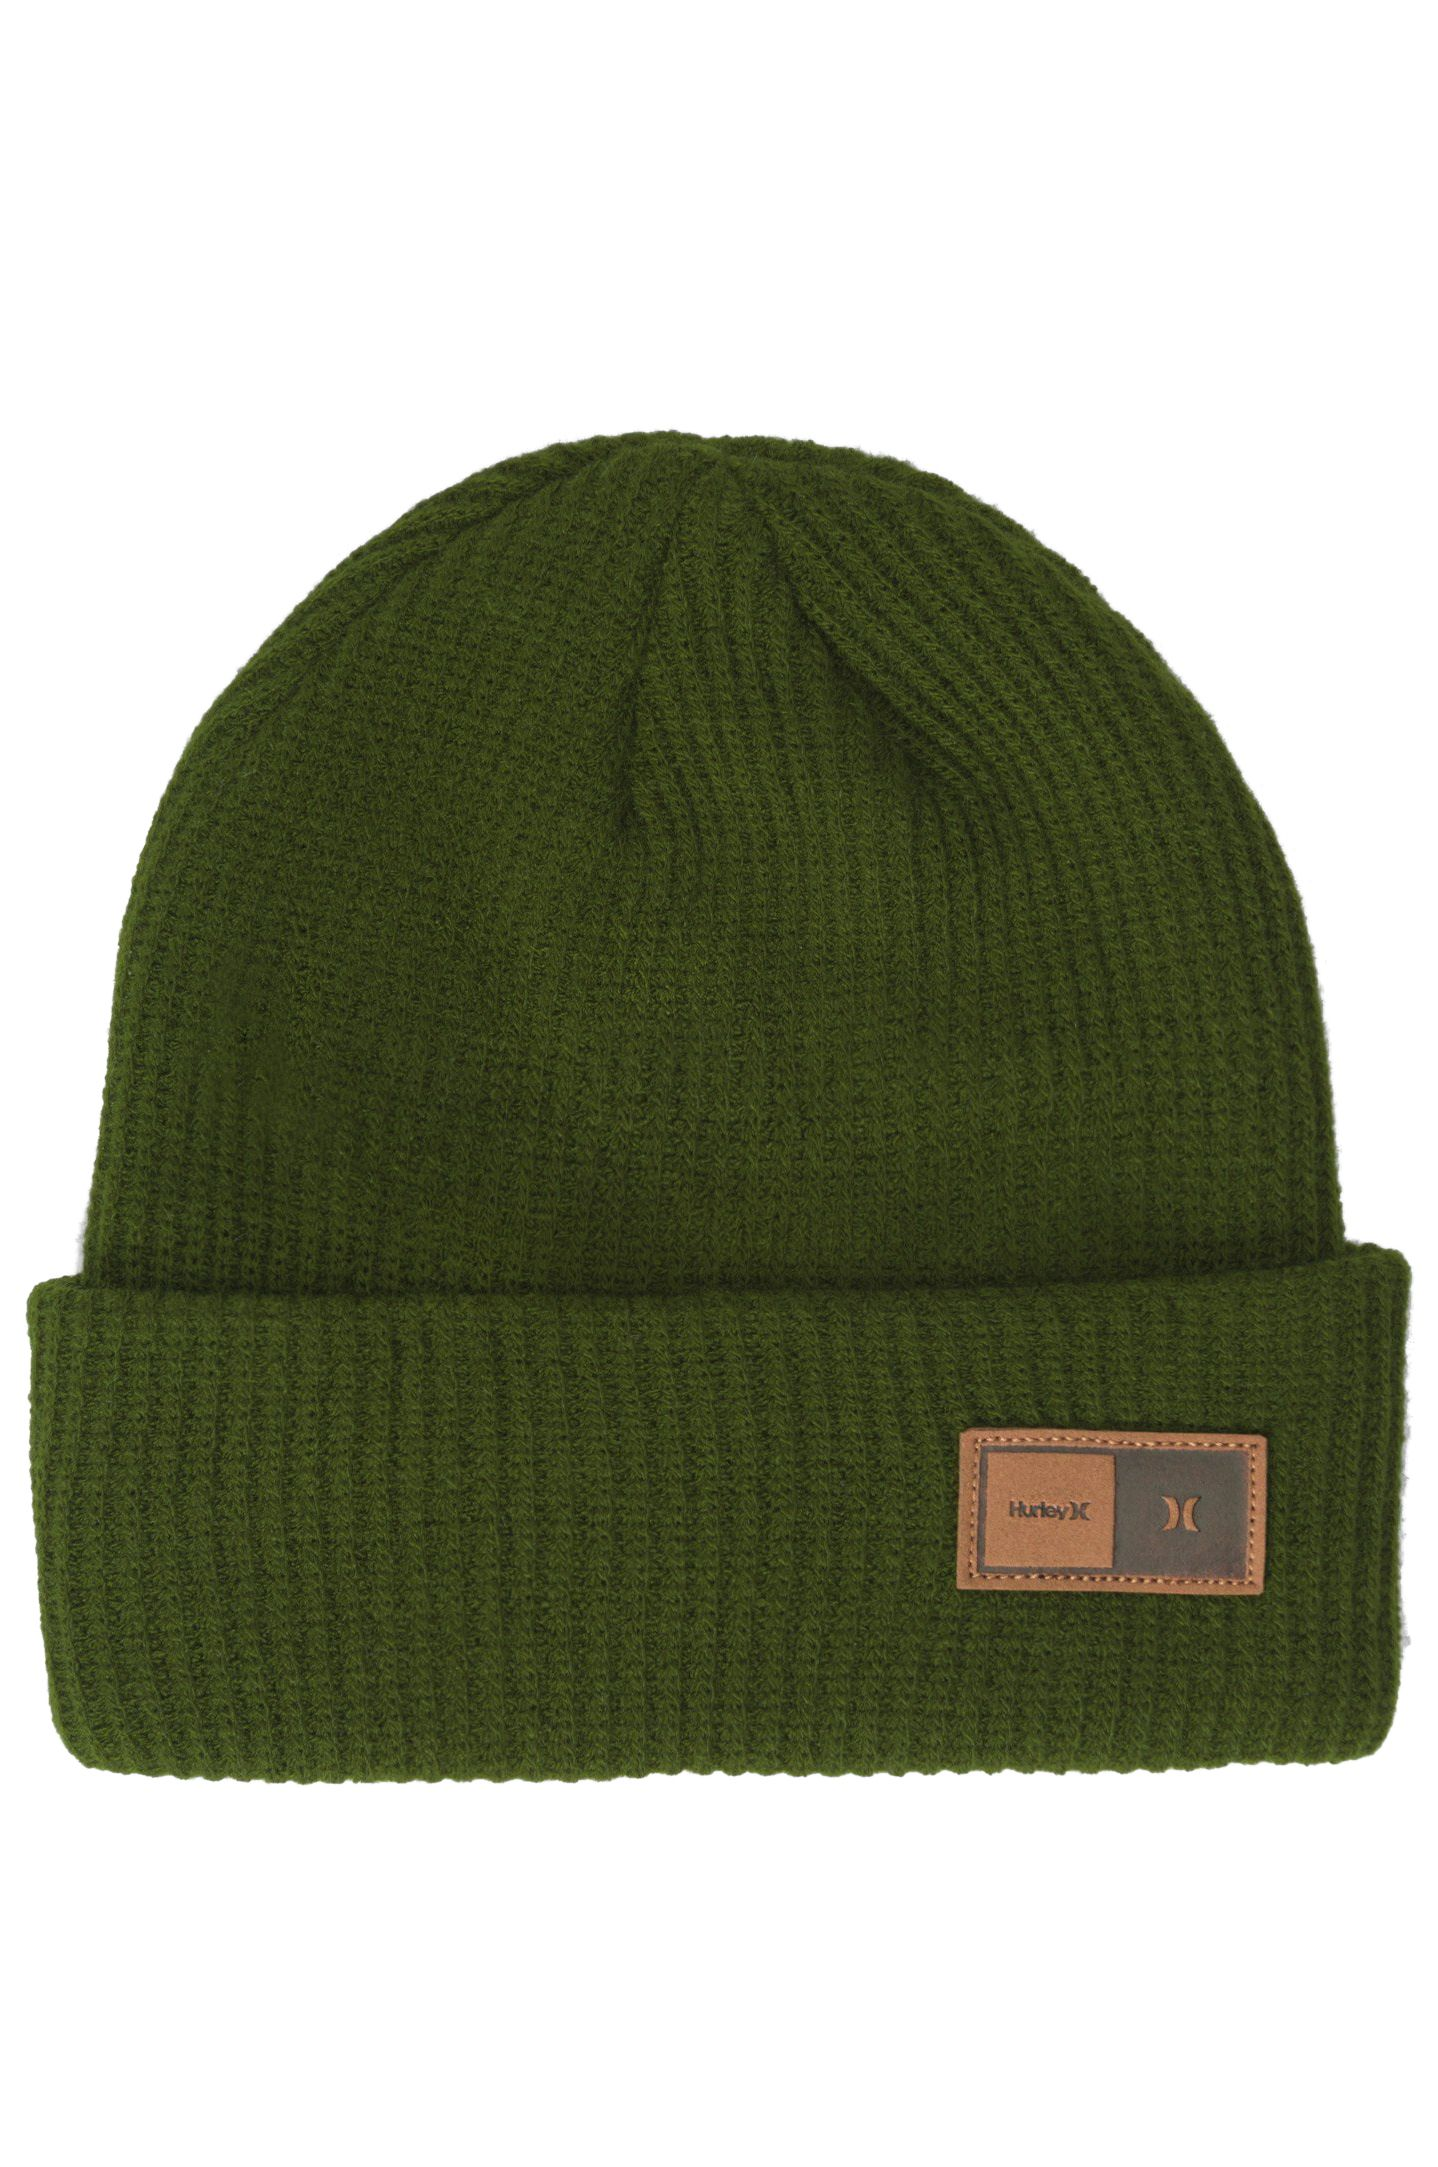 Gorro Hurley M NORTHRIDGE BEANIE Vintage Green